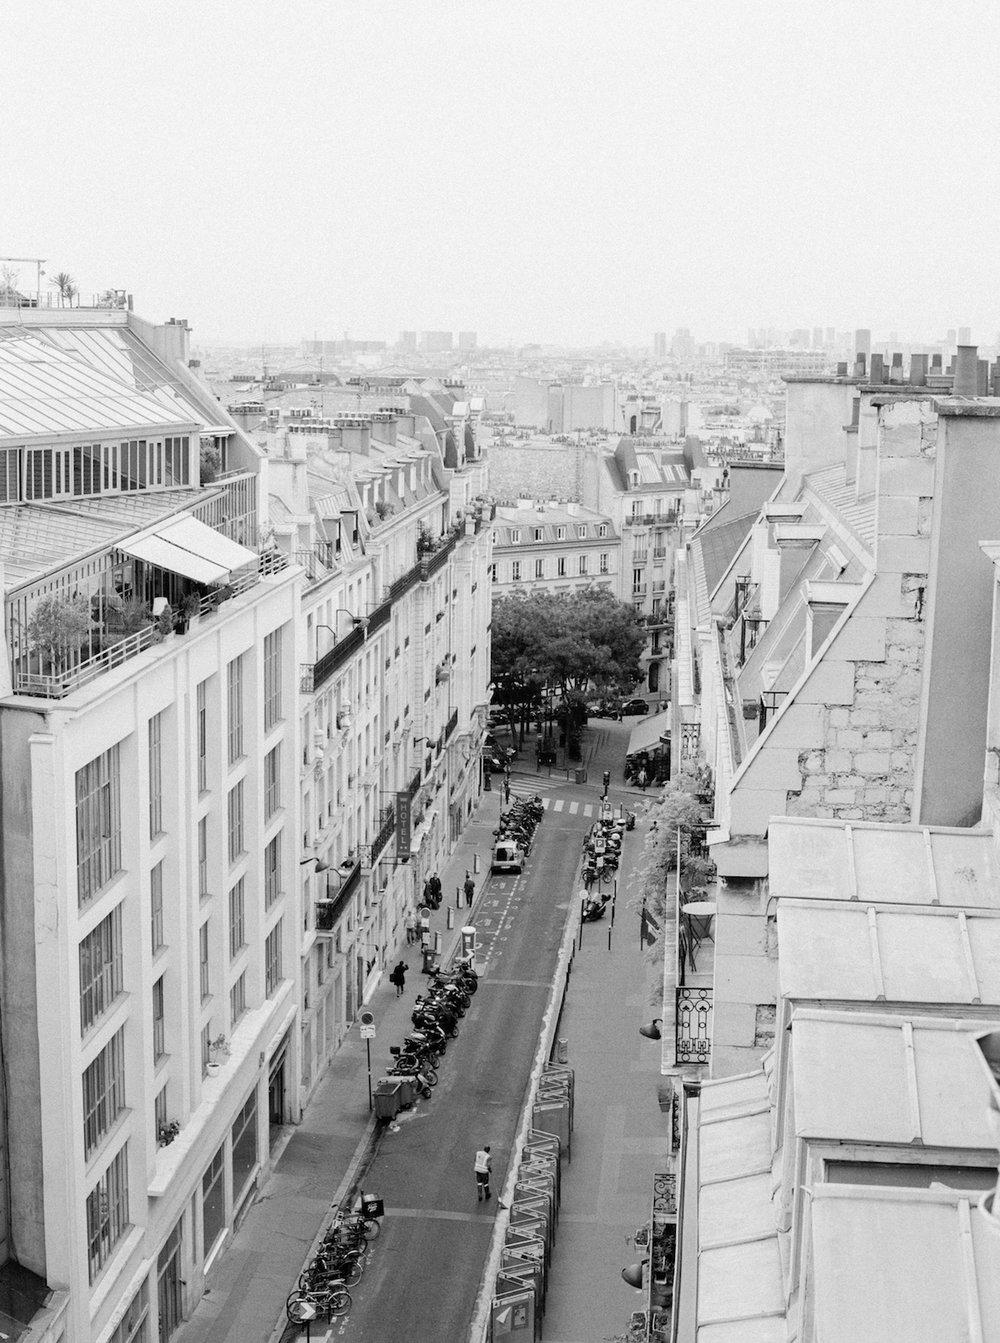 parisblog-33.jpg